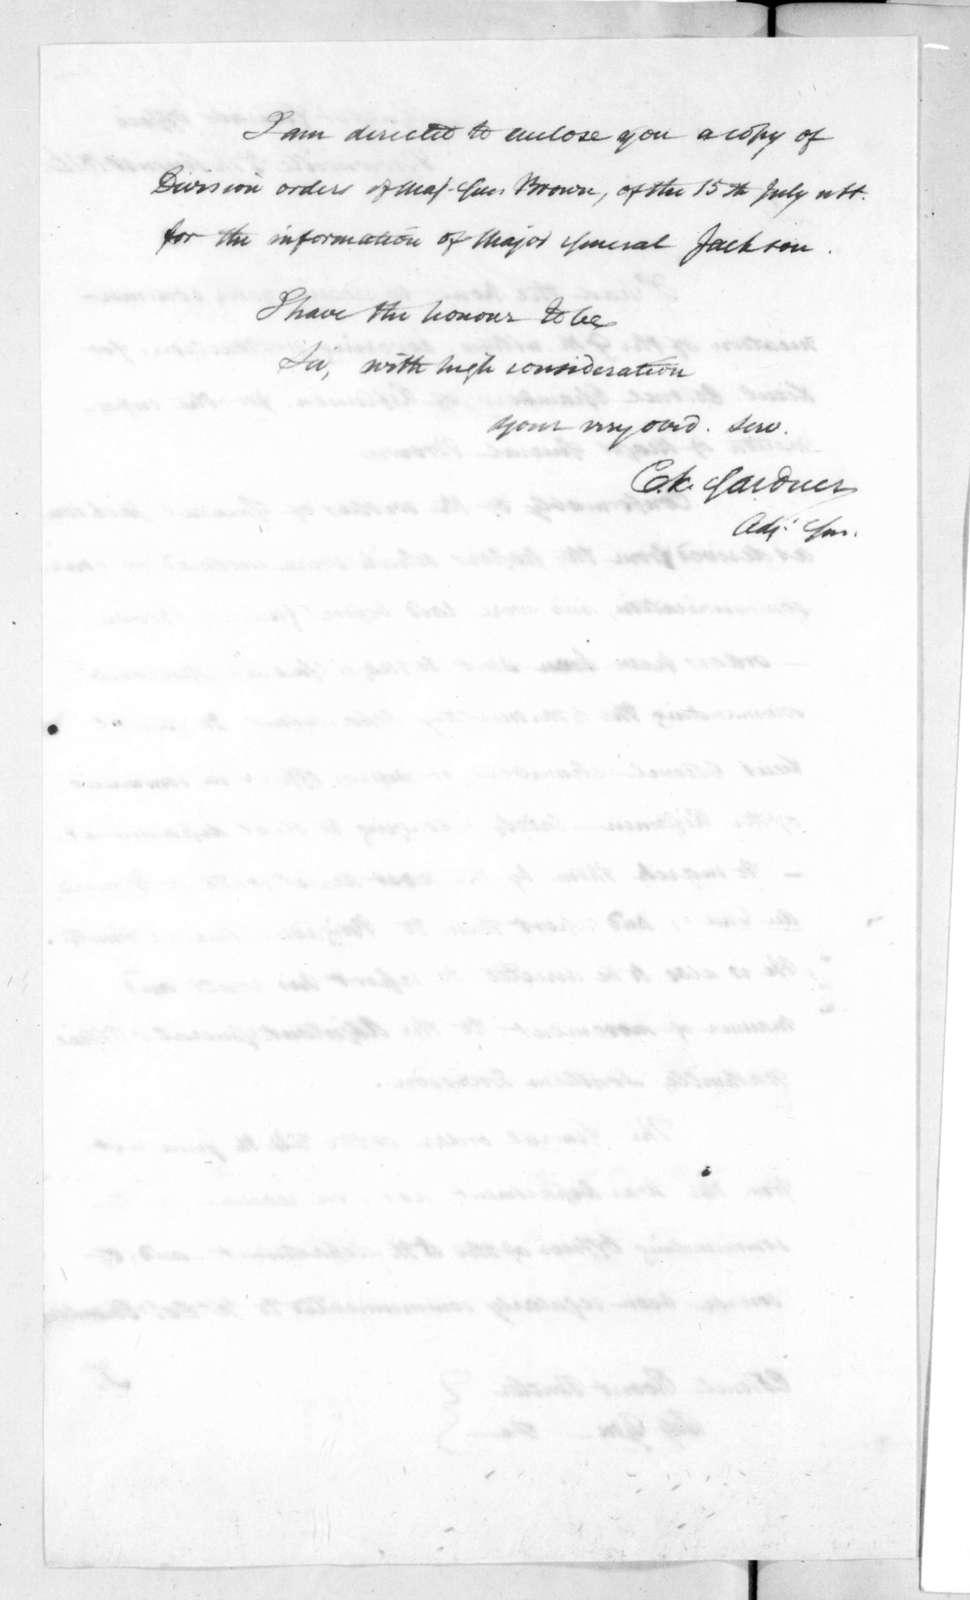 Charles Kitchel Gardner to Robert Butler, August 5, 1816